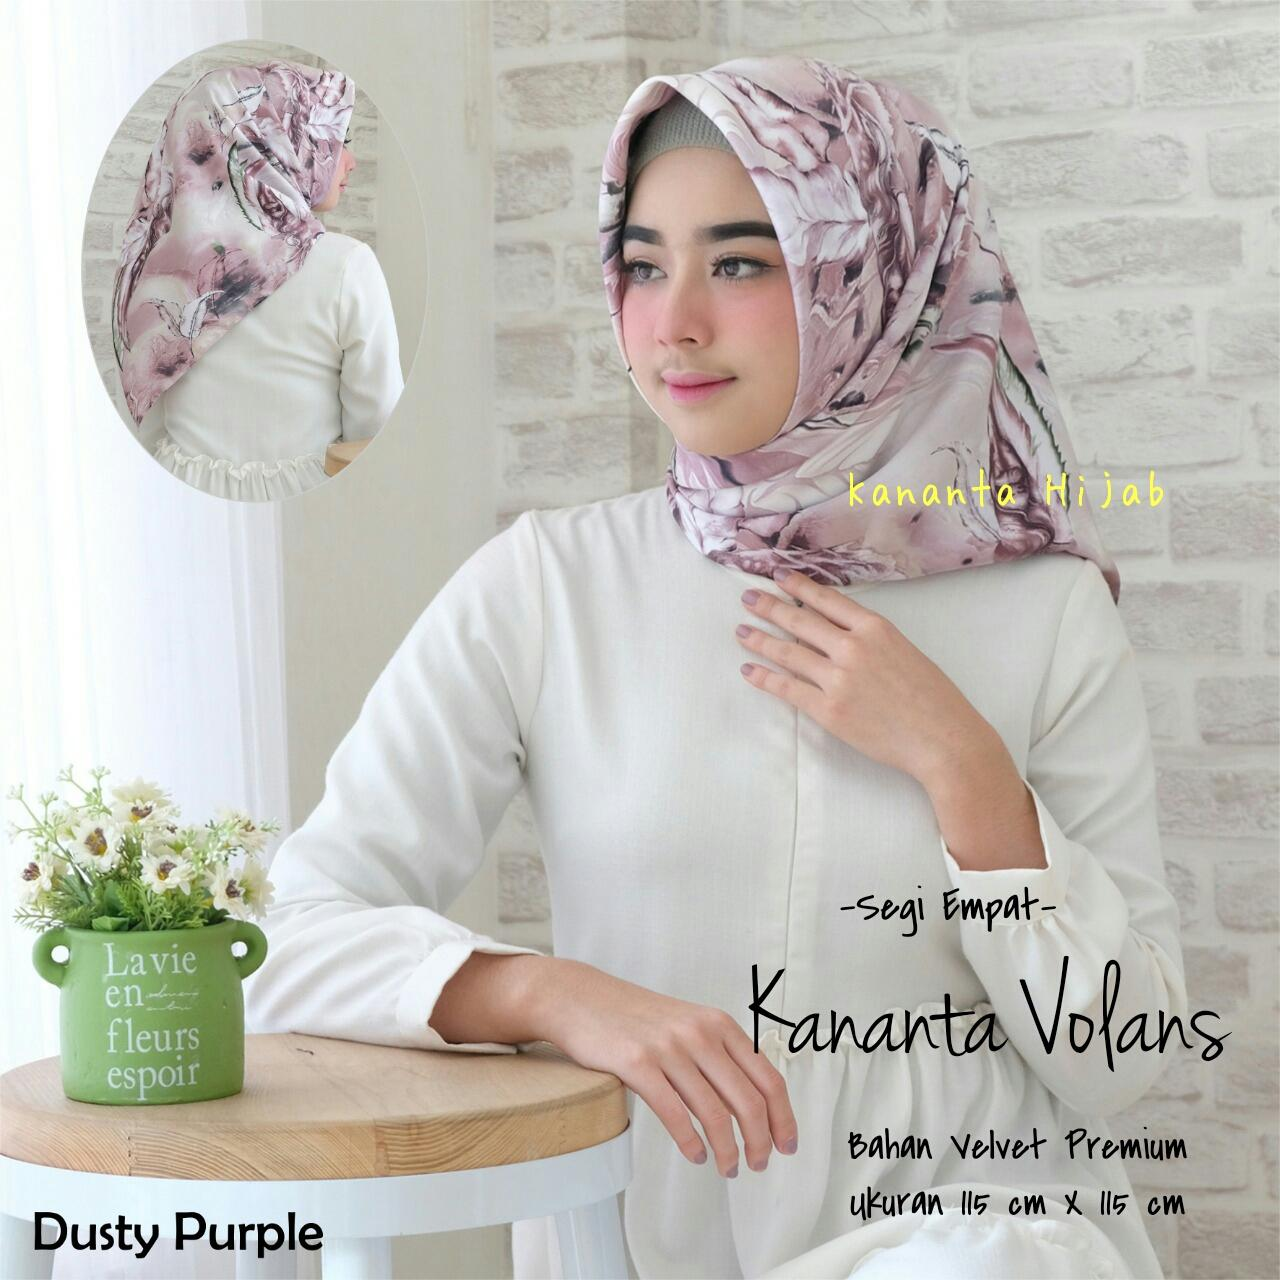 Buy Sell Cheapest Square Shabby Maxmara Best Quality Product Deals Hijab New Voal Segiempat Exlusive Print Limited Segi Empat Motif Abstrak Bahan Velvet Premium Kananta Volans